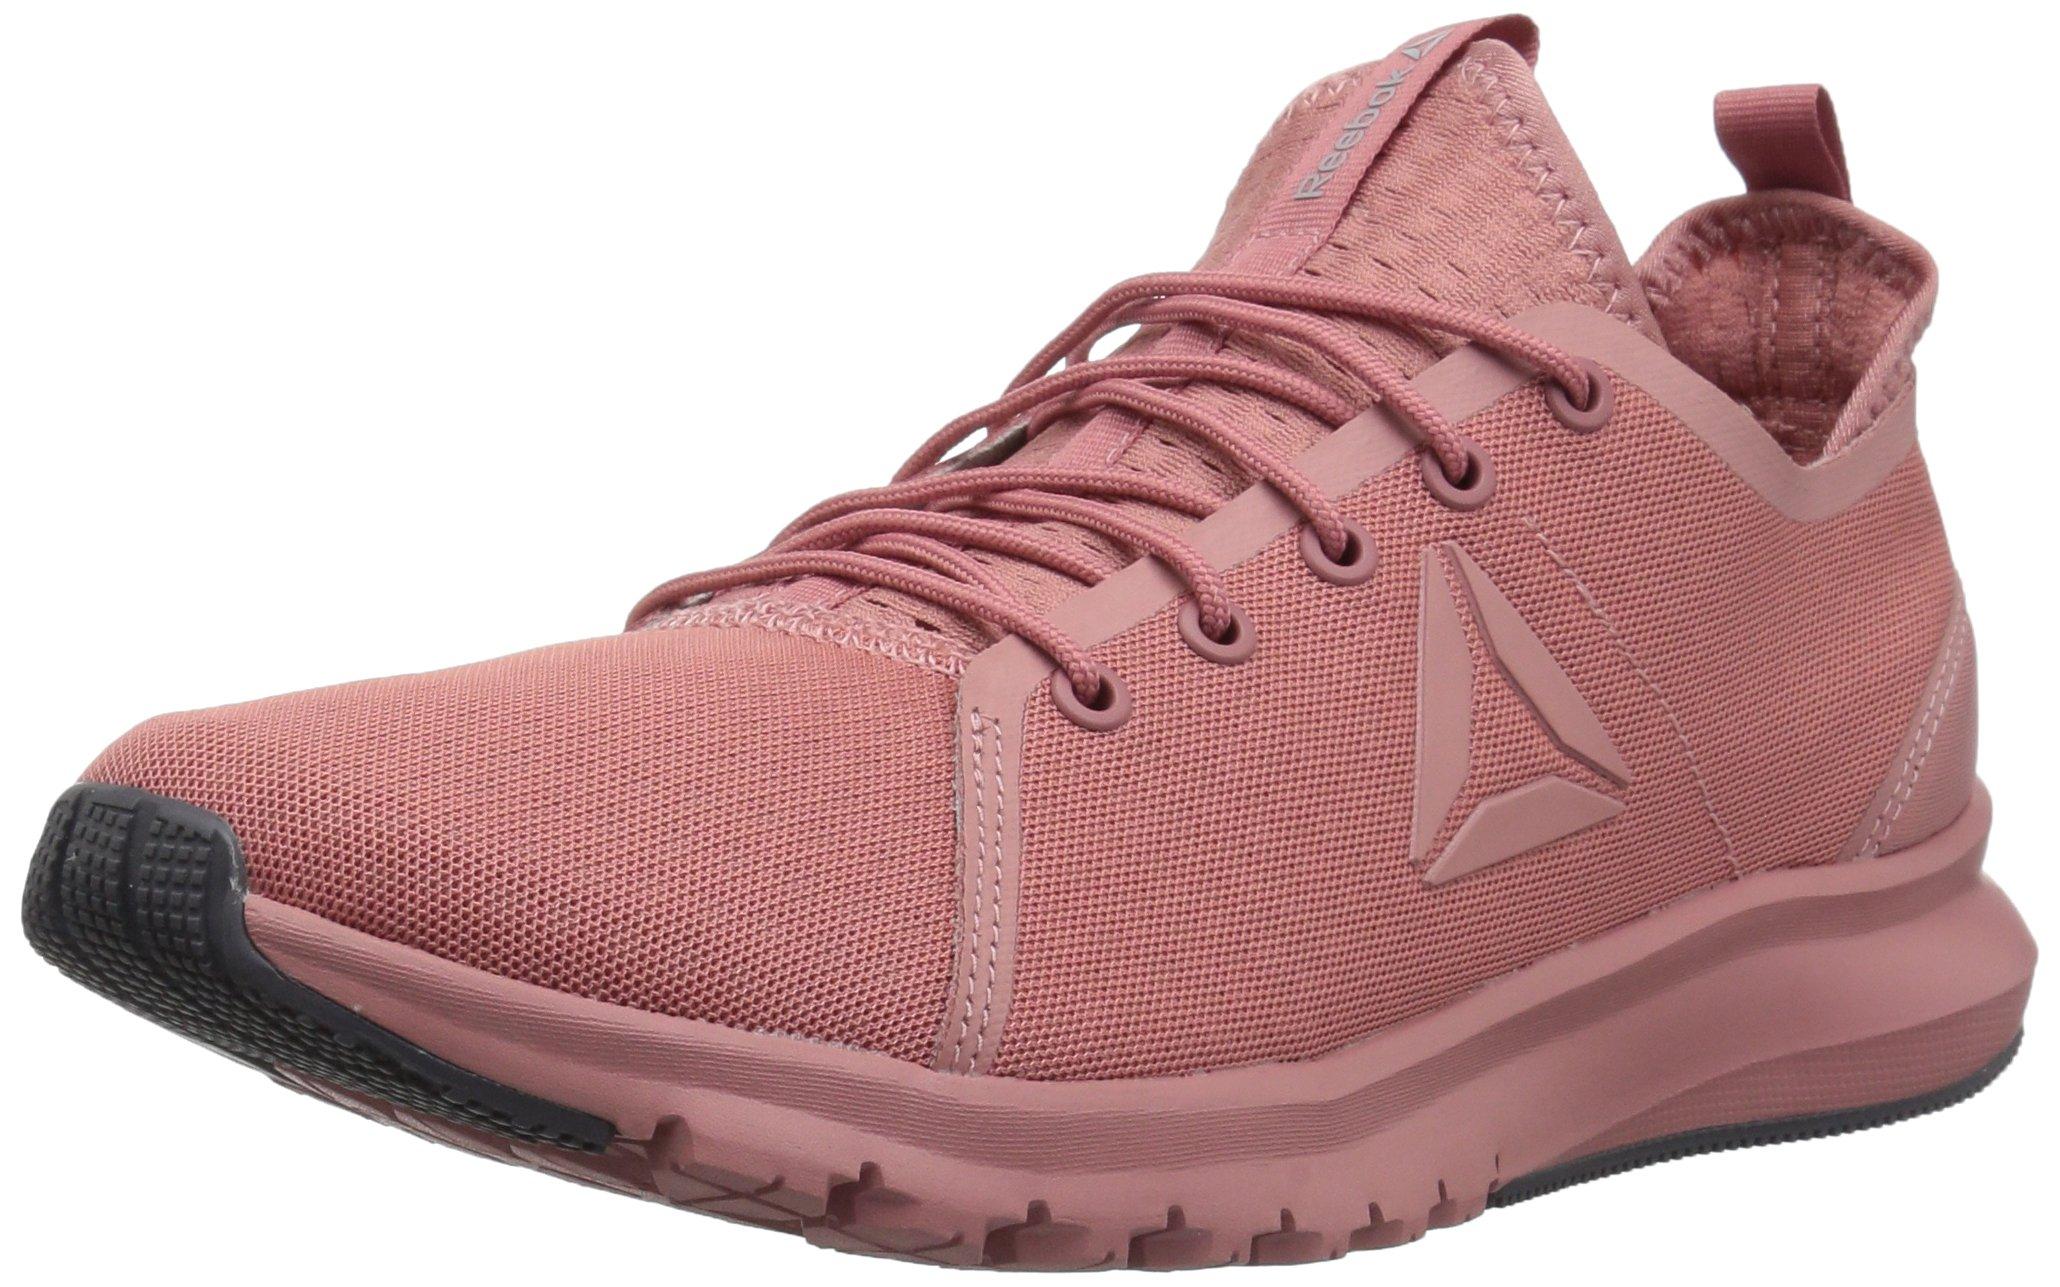 Reebok Women's Plus Lite Track Shoe, Sandy Rose/Shell Pink/White/Ash Grey/Skull Grey, 6.5 M US